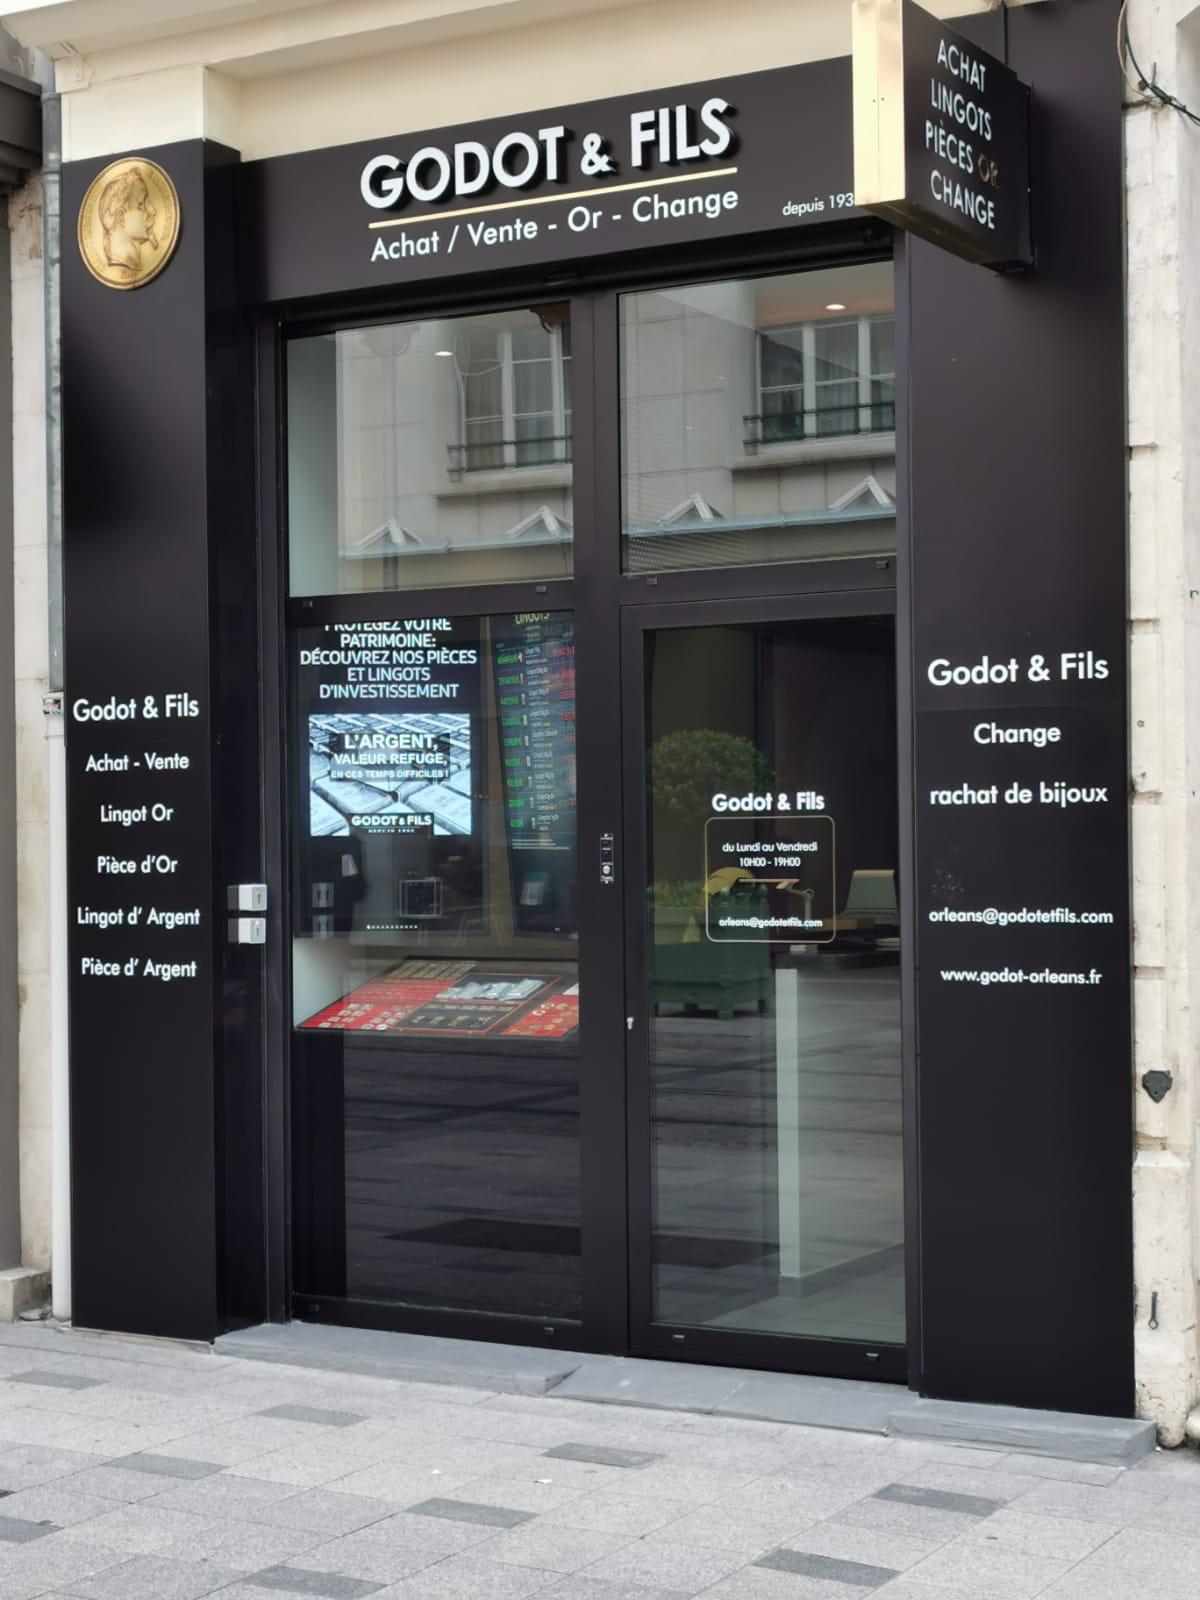 godot-et-fils-Achat-Or-Orleans